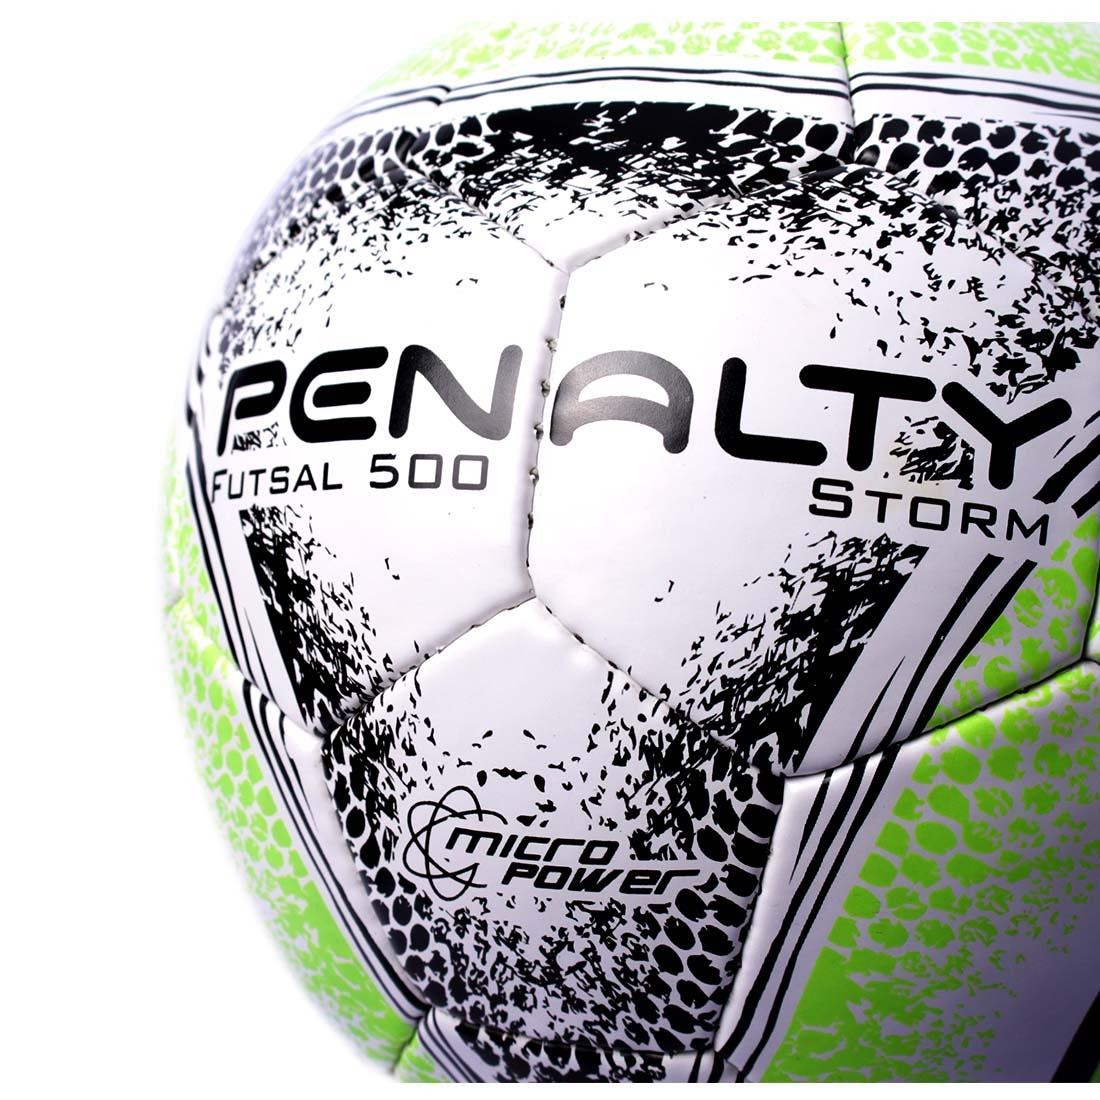 0a51bcfed4 bola futsal penalty storm 500 costurada viii. Carregando zoom.